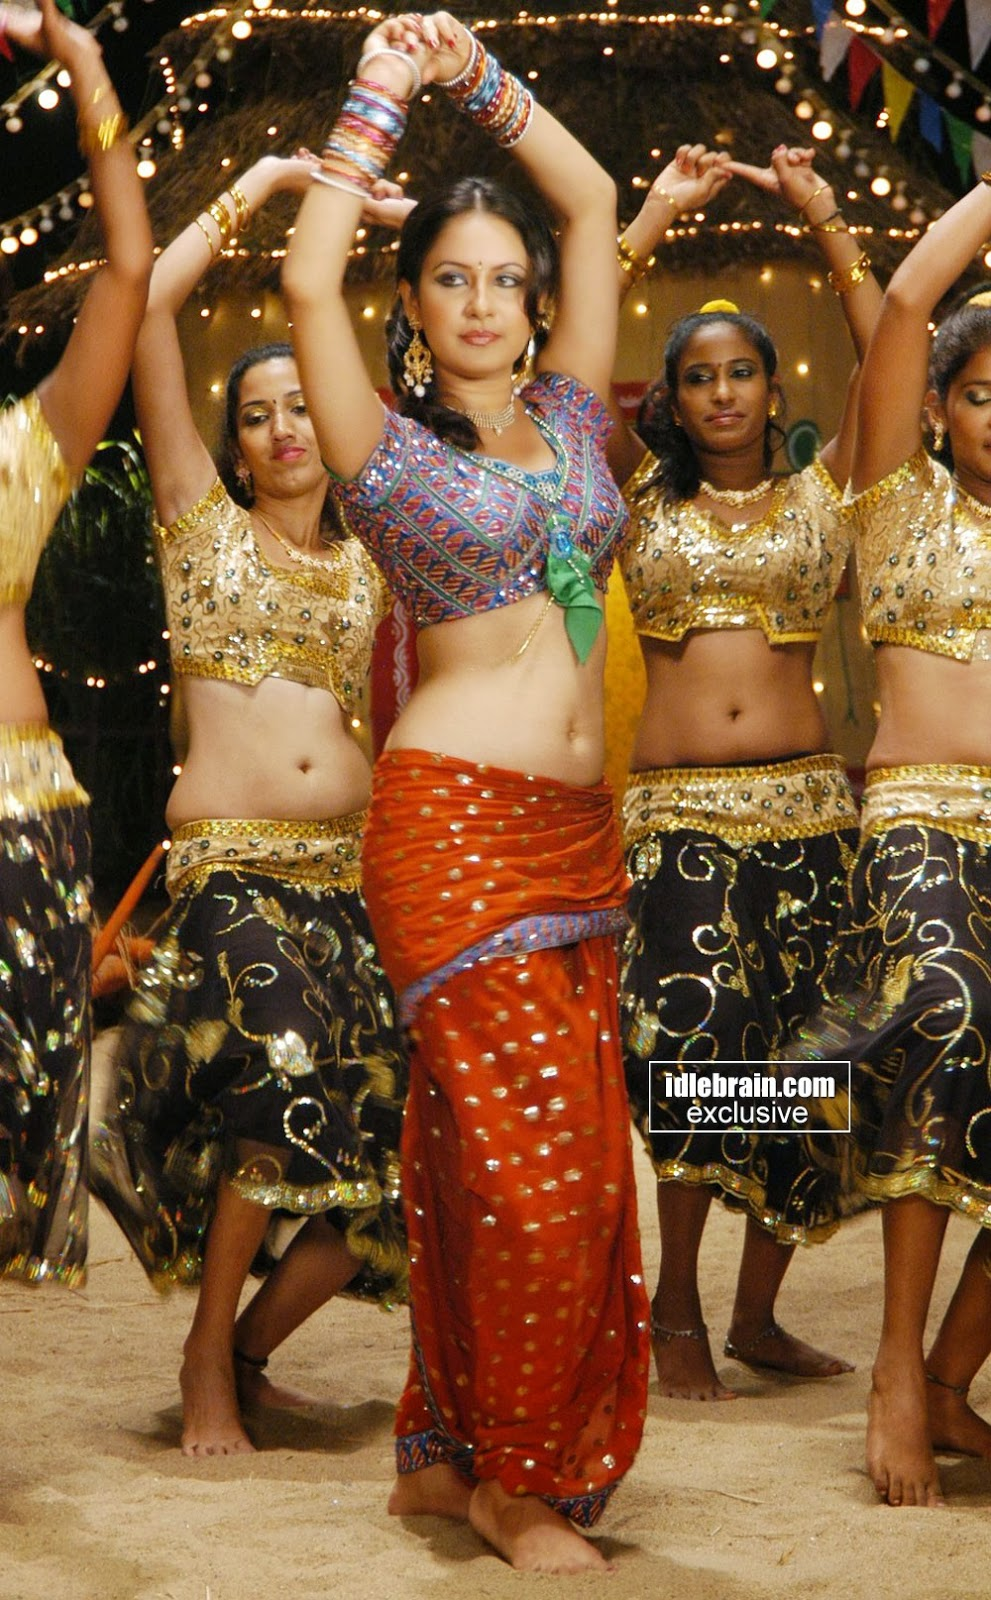 11 Best Pooja Unit Images On Pinterest: Indian Garam Masala: Bengali Actress Pooja Bose Hot Spicy